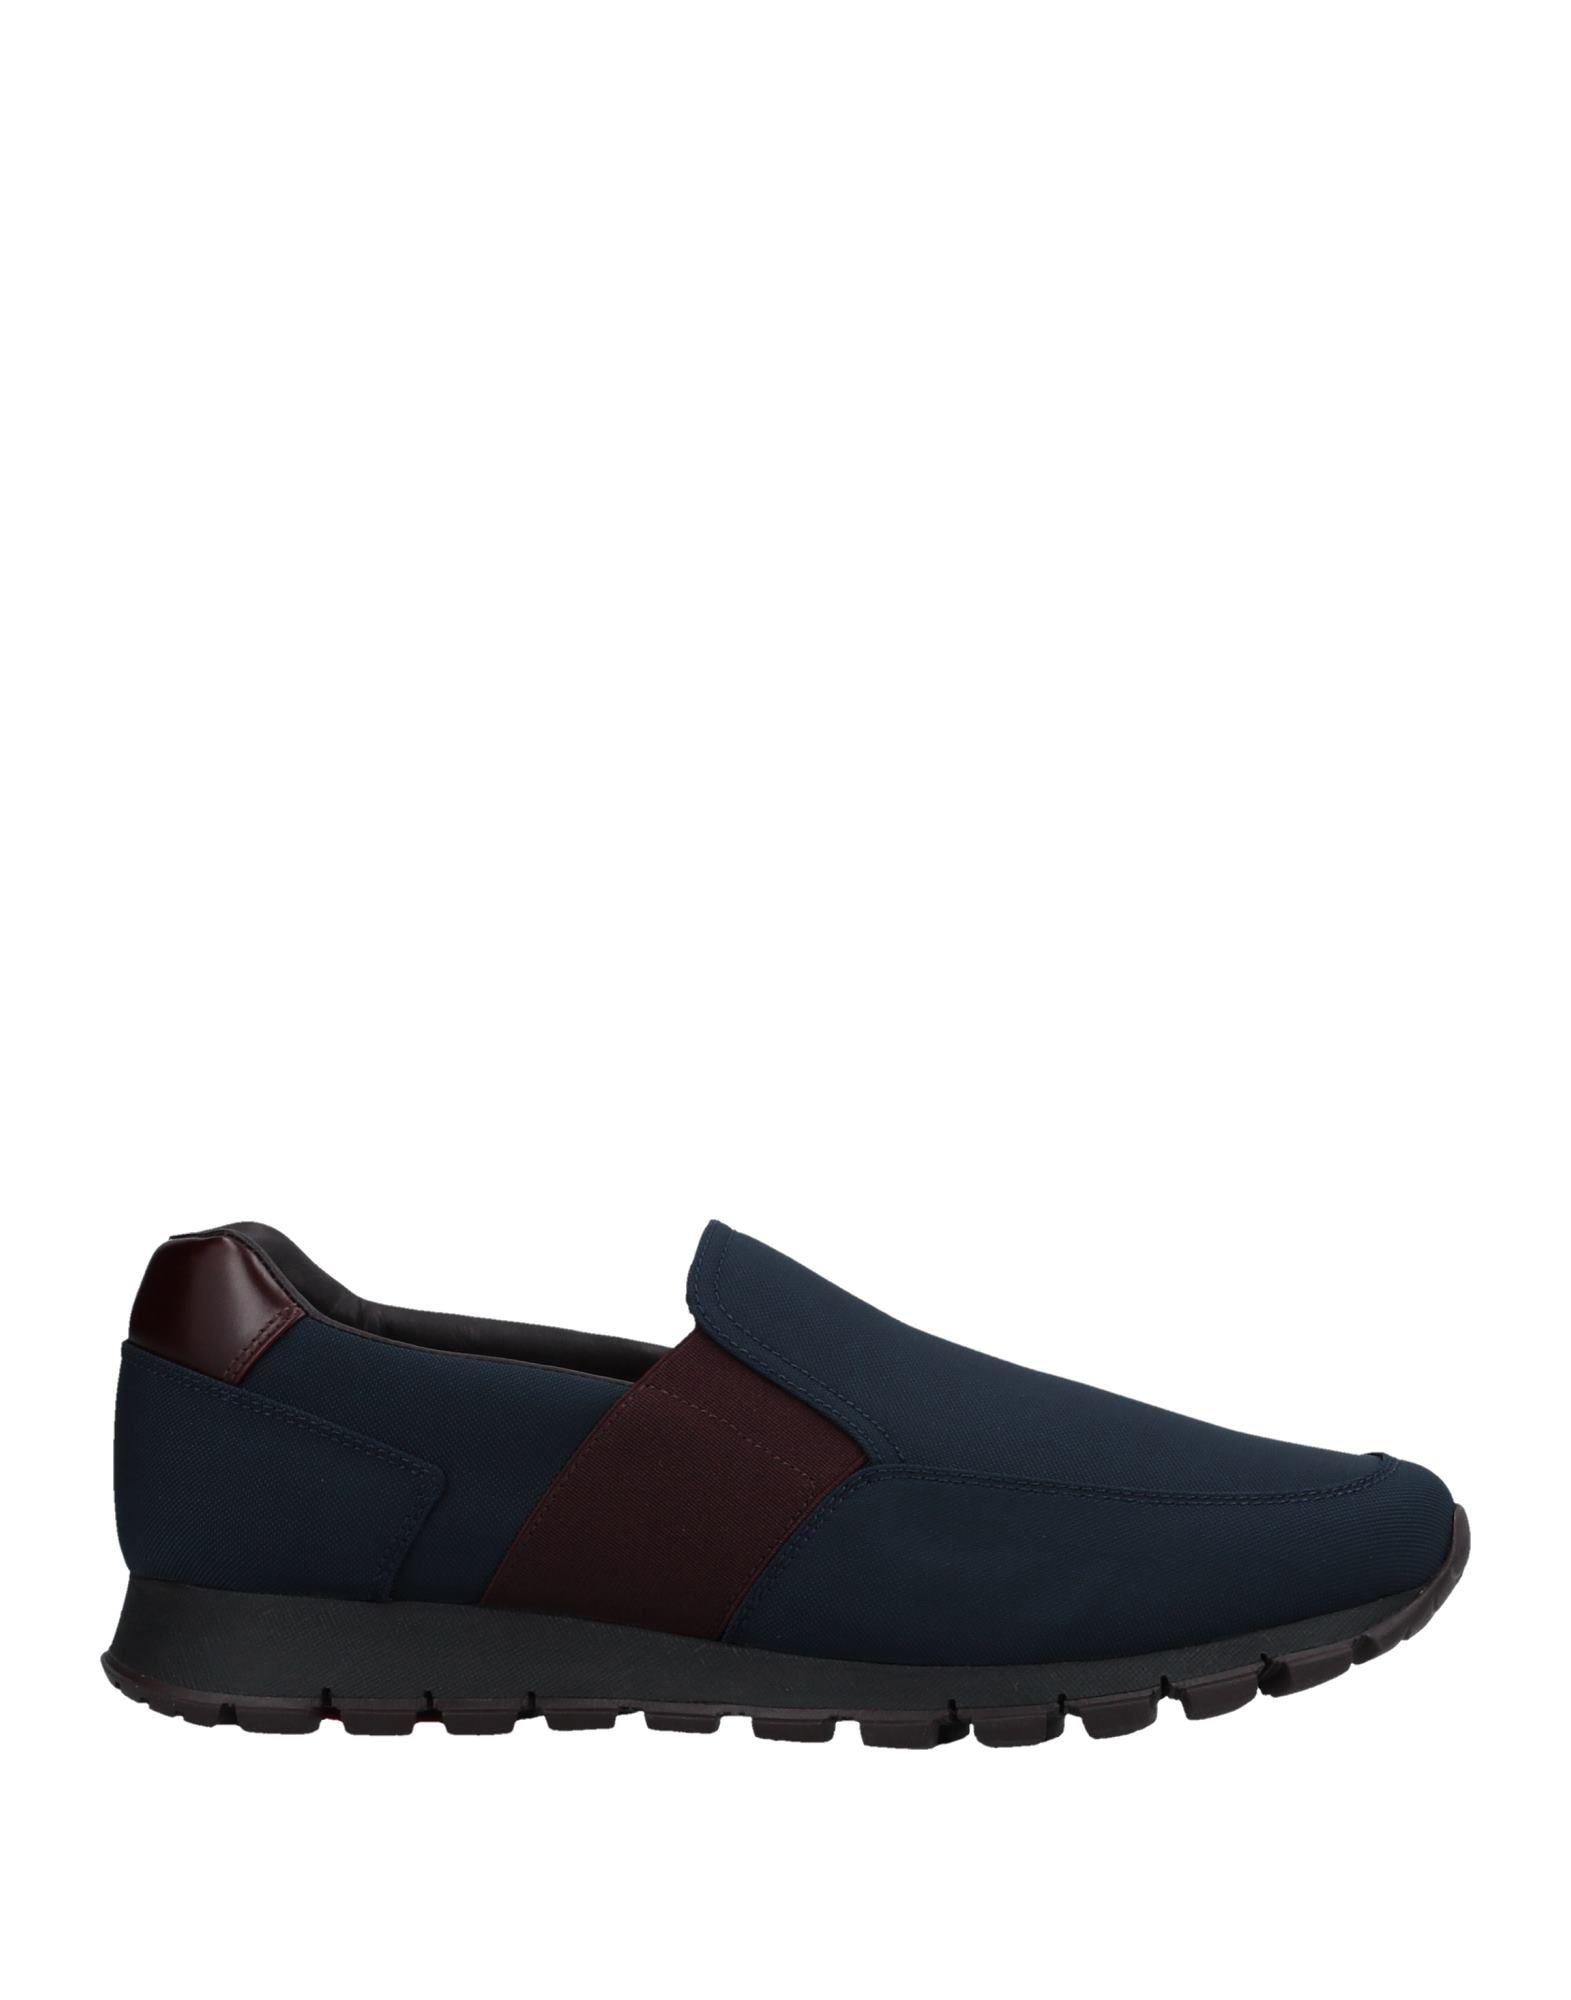 Prada Sport Sneakers Qualität Herren  11508428PG Gute Qualität Sneakers beliebte Schuhe ce6e25